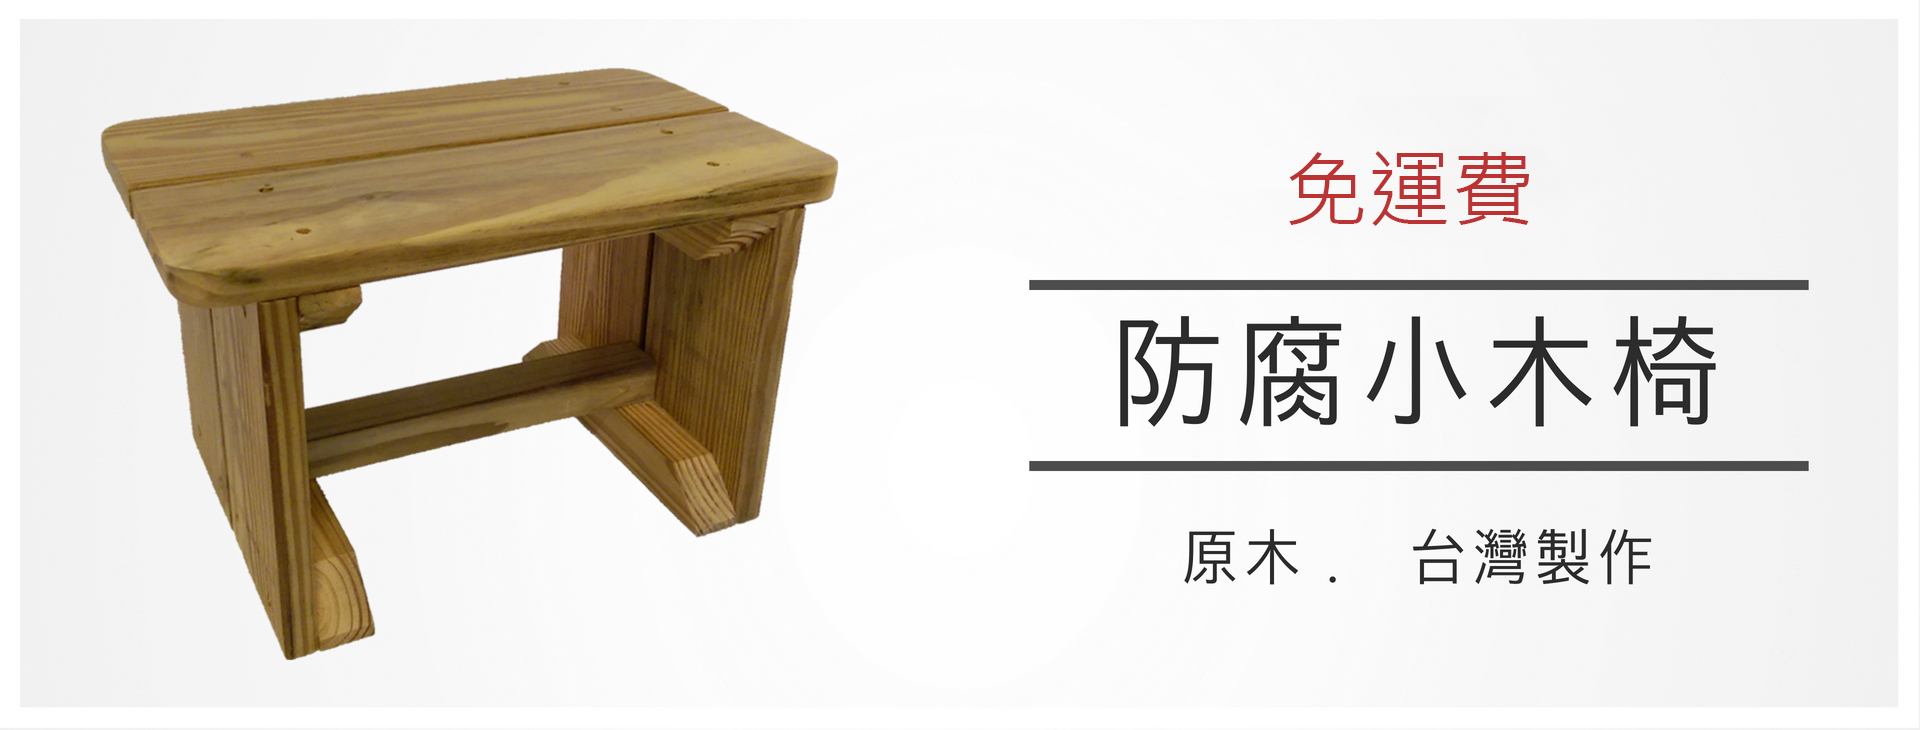 chair 防腐小木椅